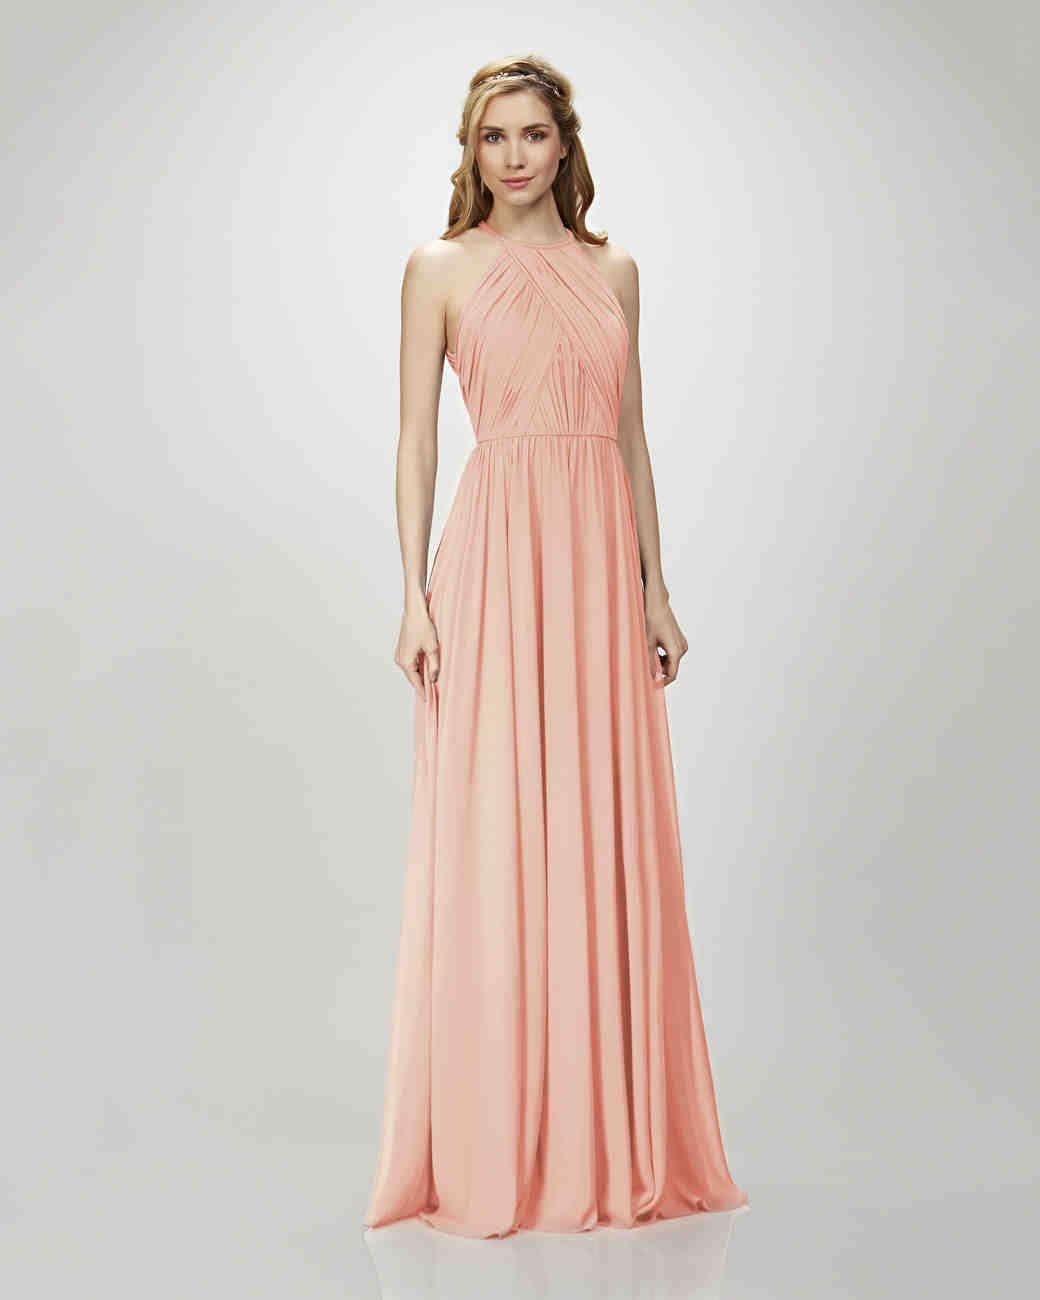 Coral bridesmaid dresses martha stewart weddings ombrellifo Choice Image